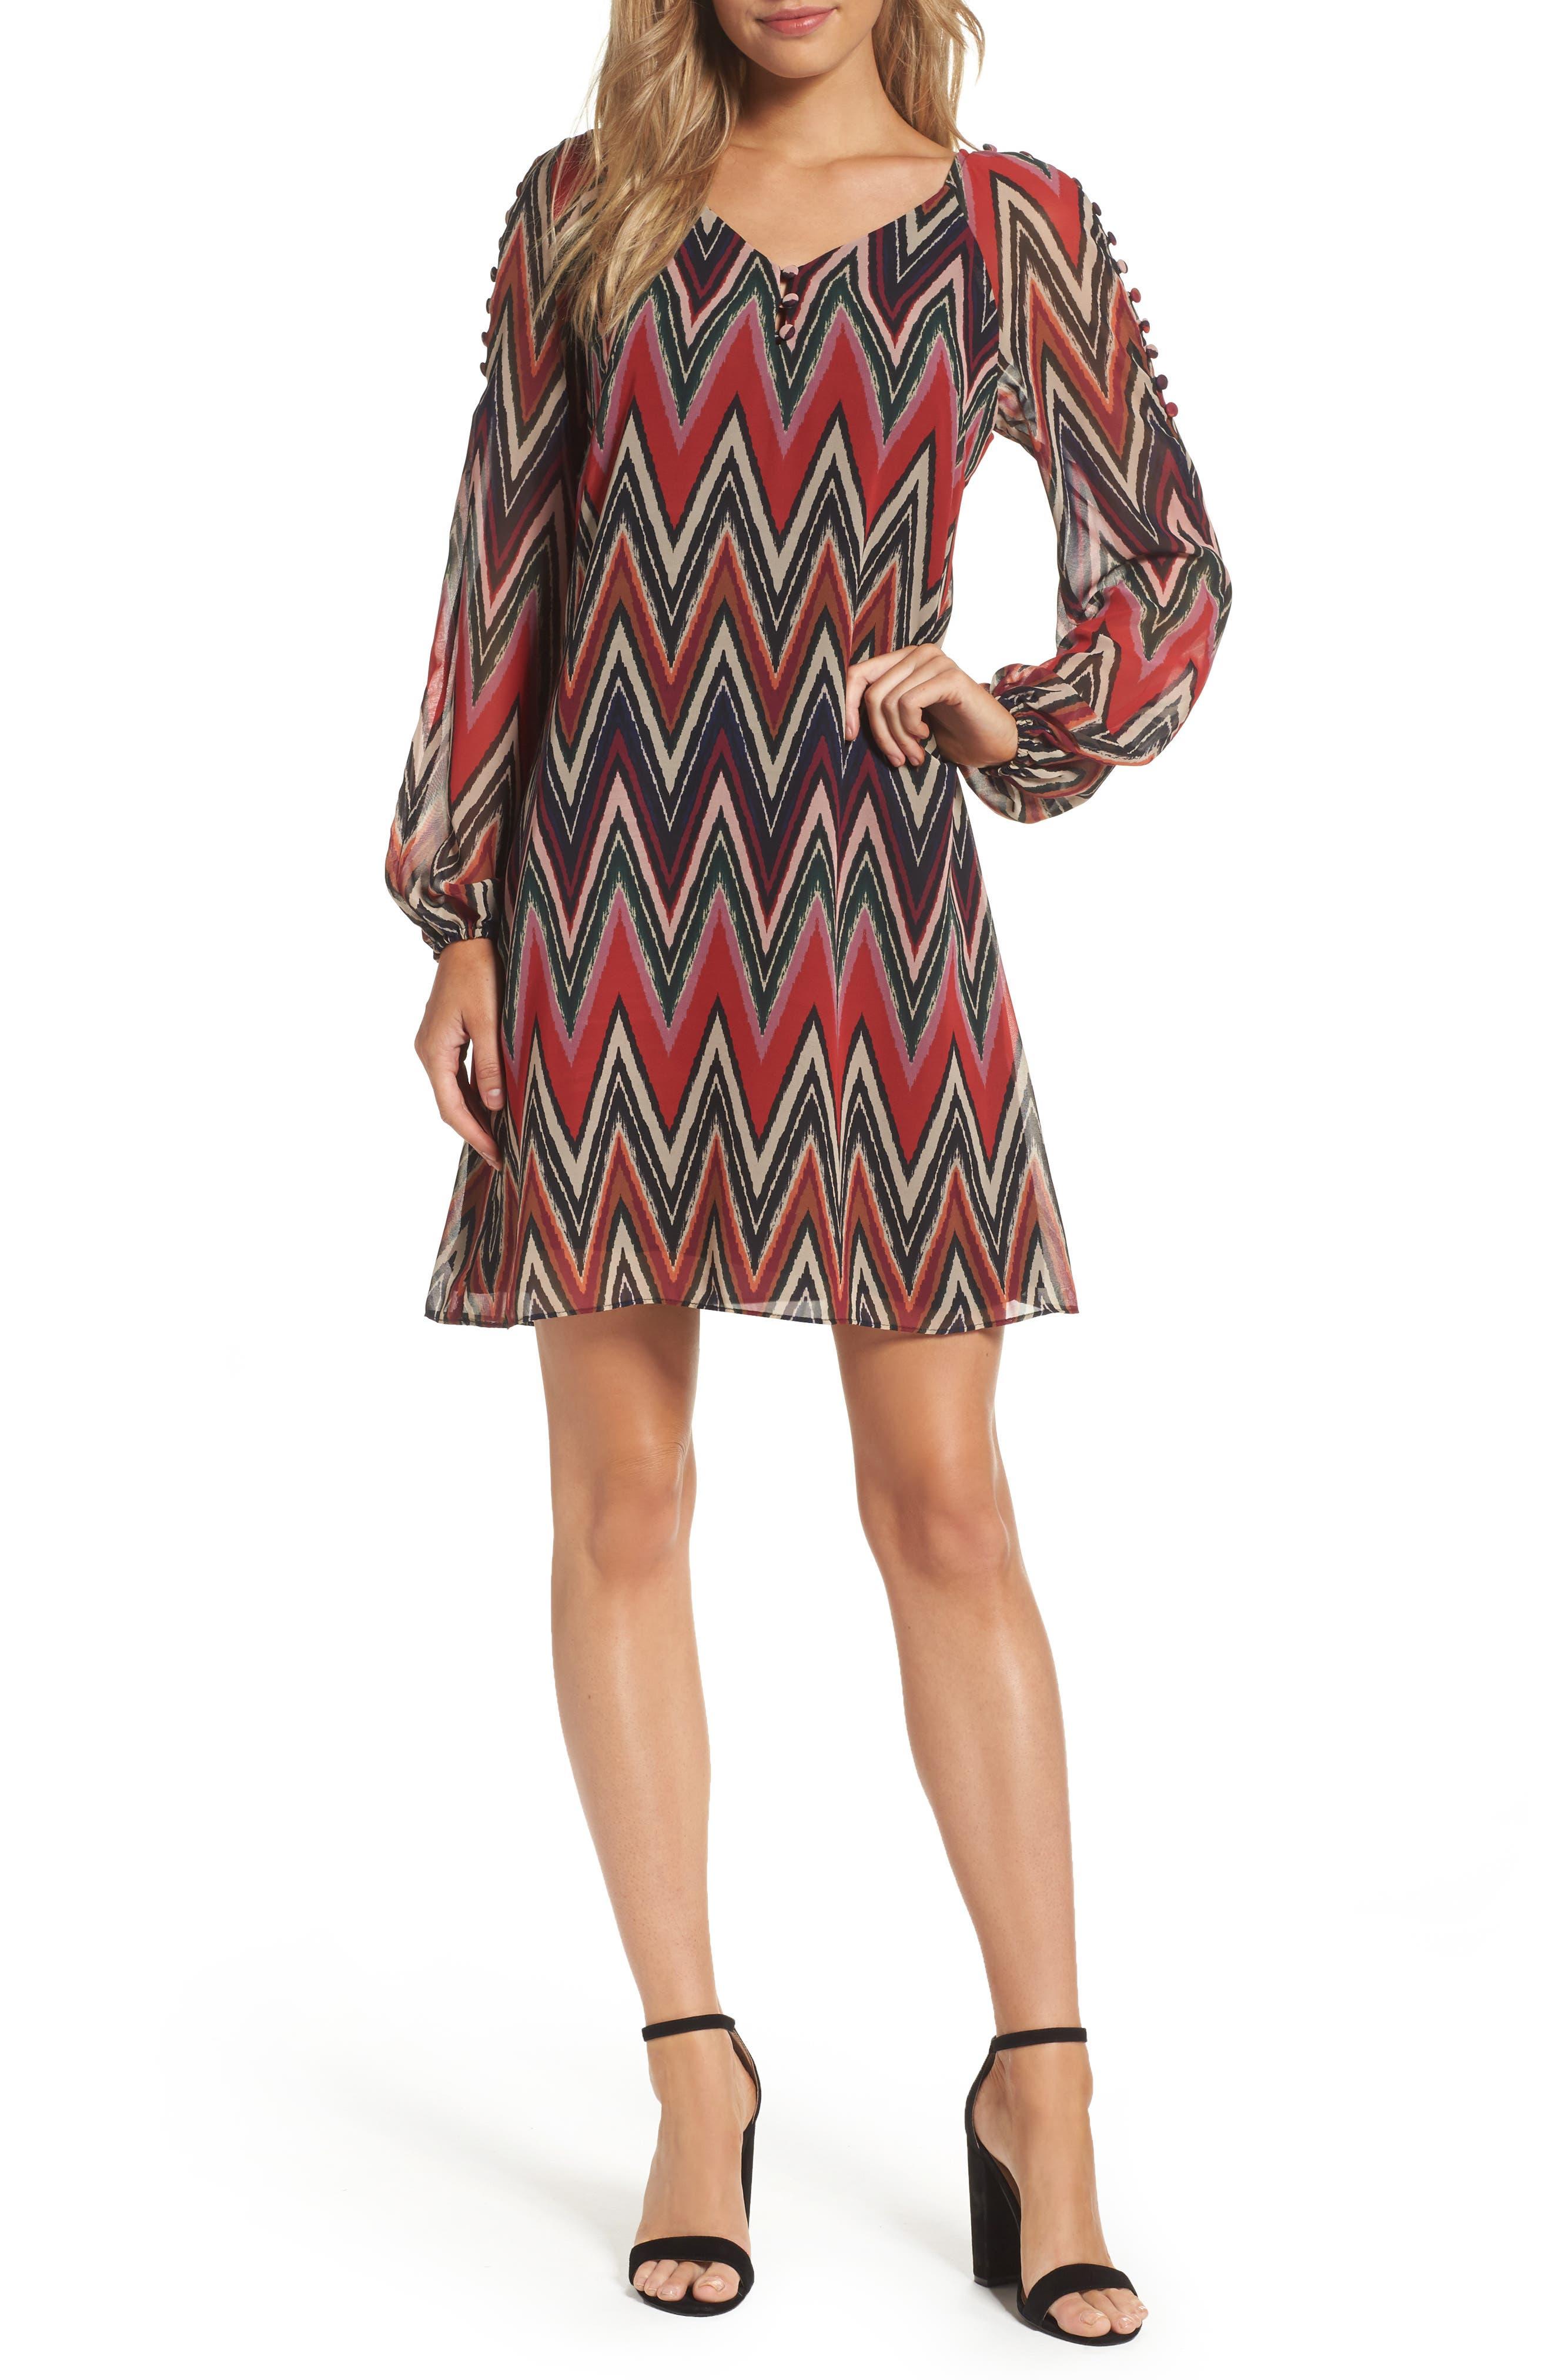 Main Image - Taylor Dresses Chevron Swing Dress